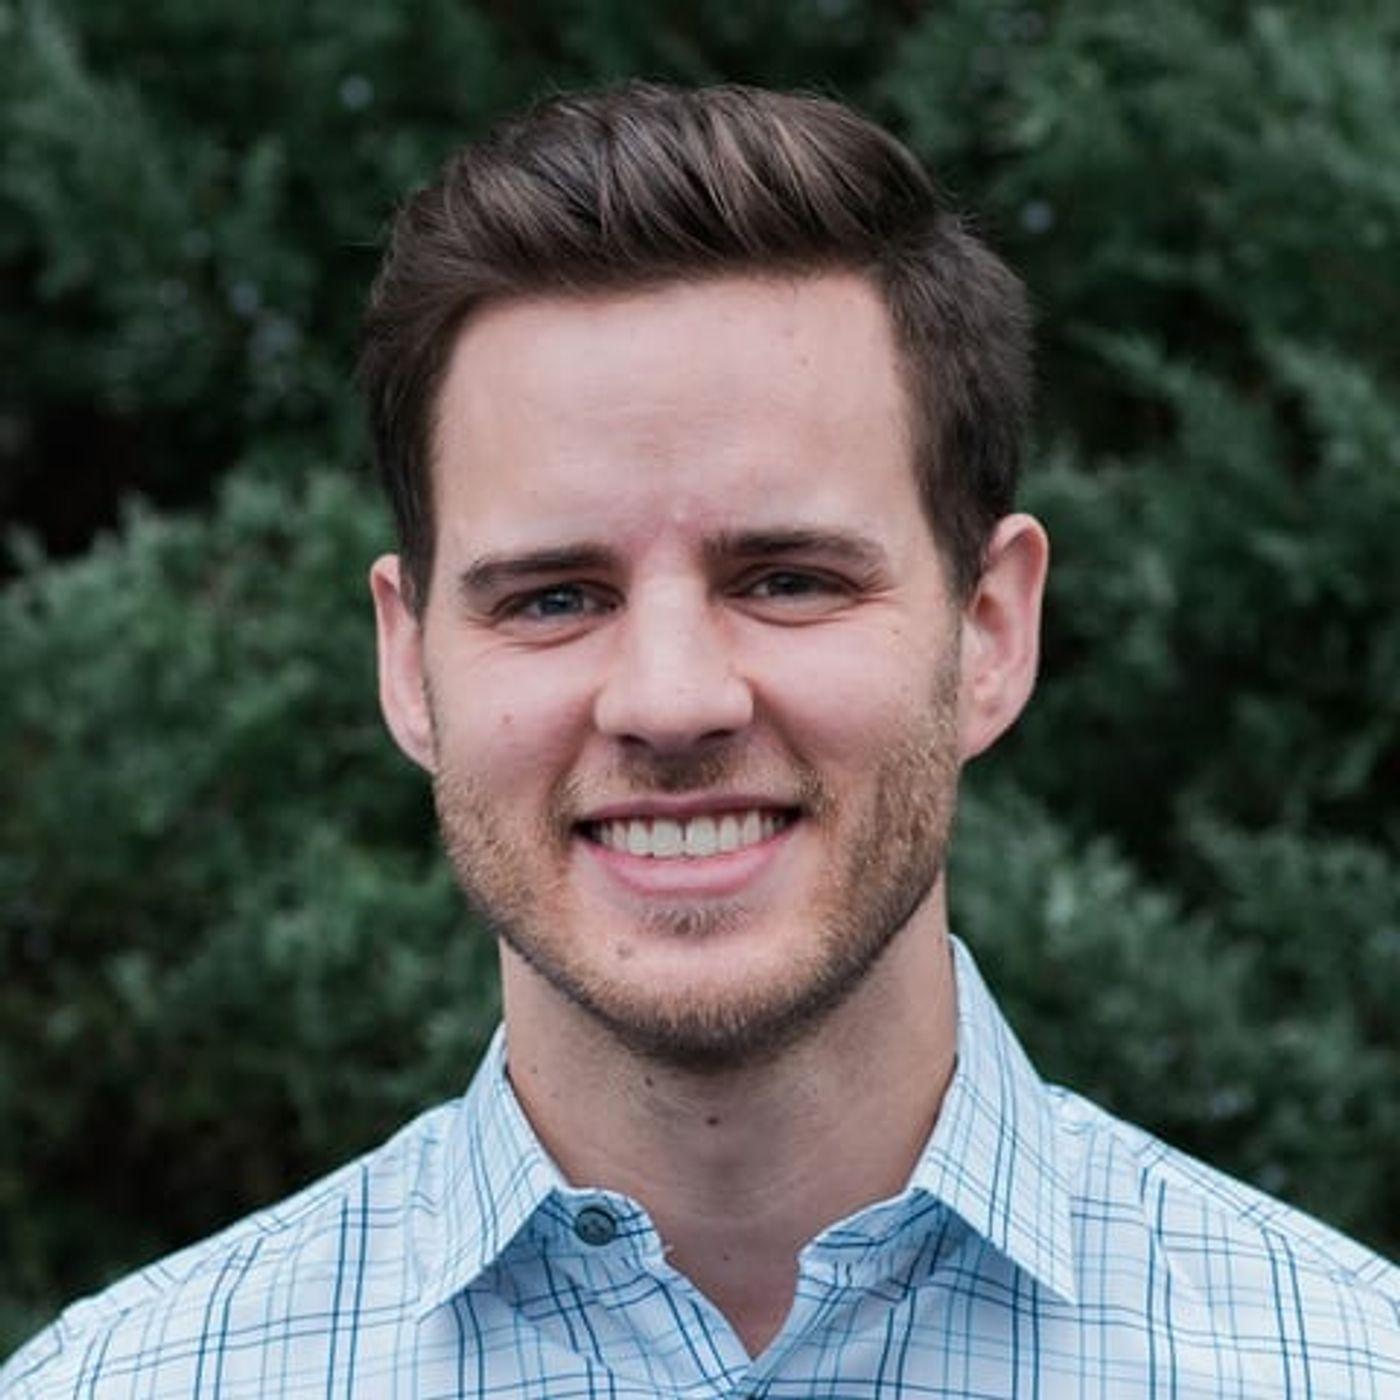 Navigating Change with Scott Ritzheimer